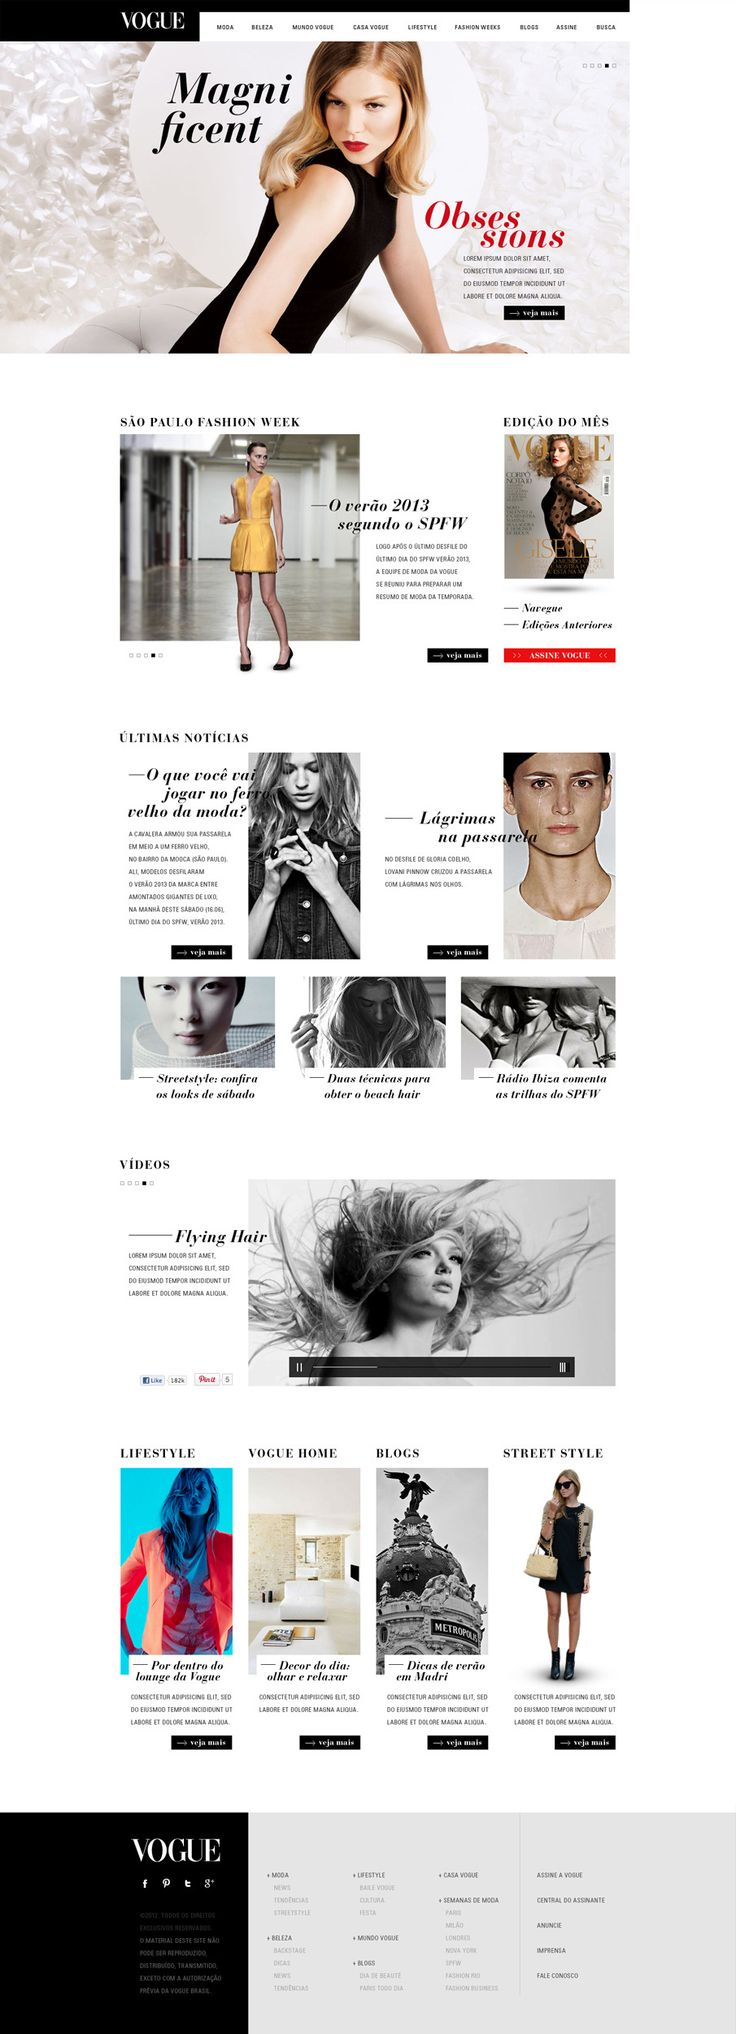 Vogue - Experimental project for Vogue Magazine #megazine #vogue #website #web #blog #webdesign #mode #fashion